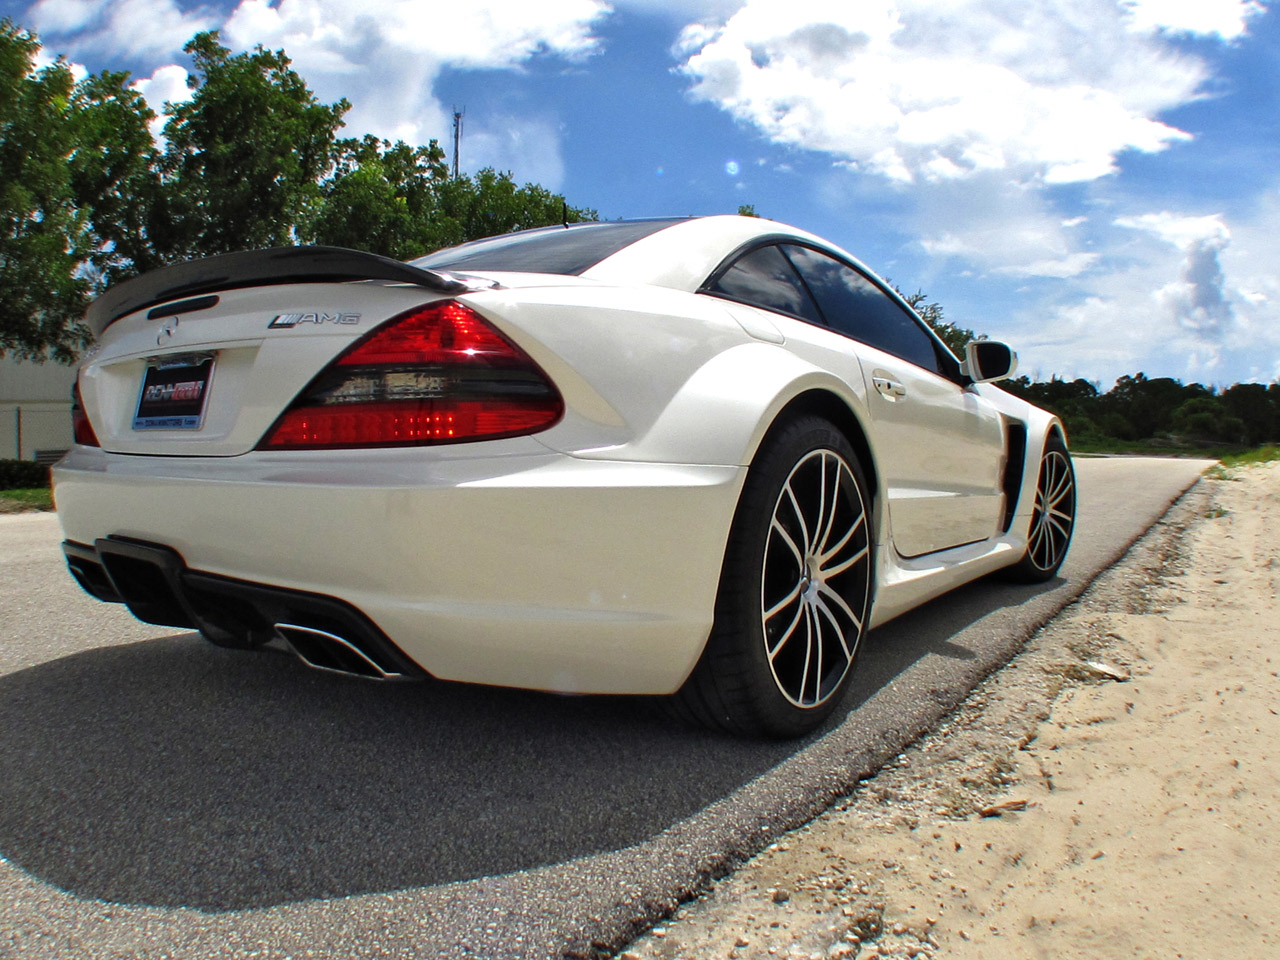 Renntech mercedes s klasse s65 amg w221 2012 renntech for Mercedes benz s65 amg v12 biturbo